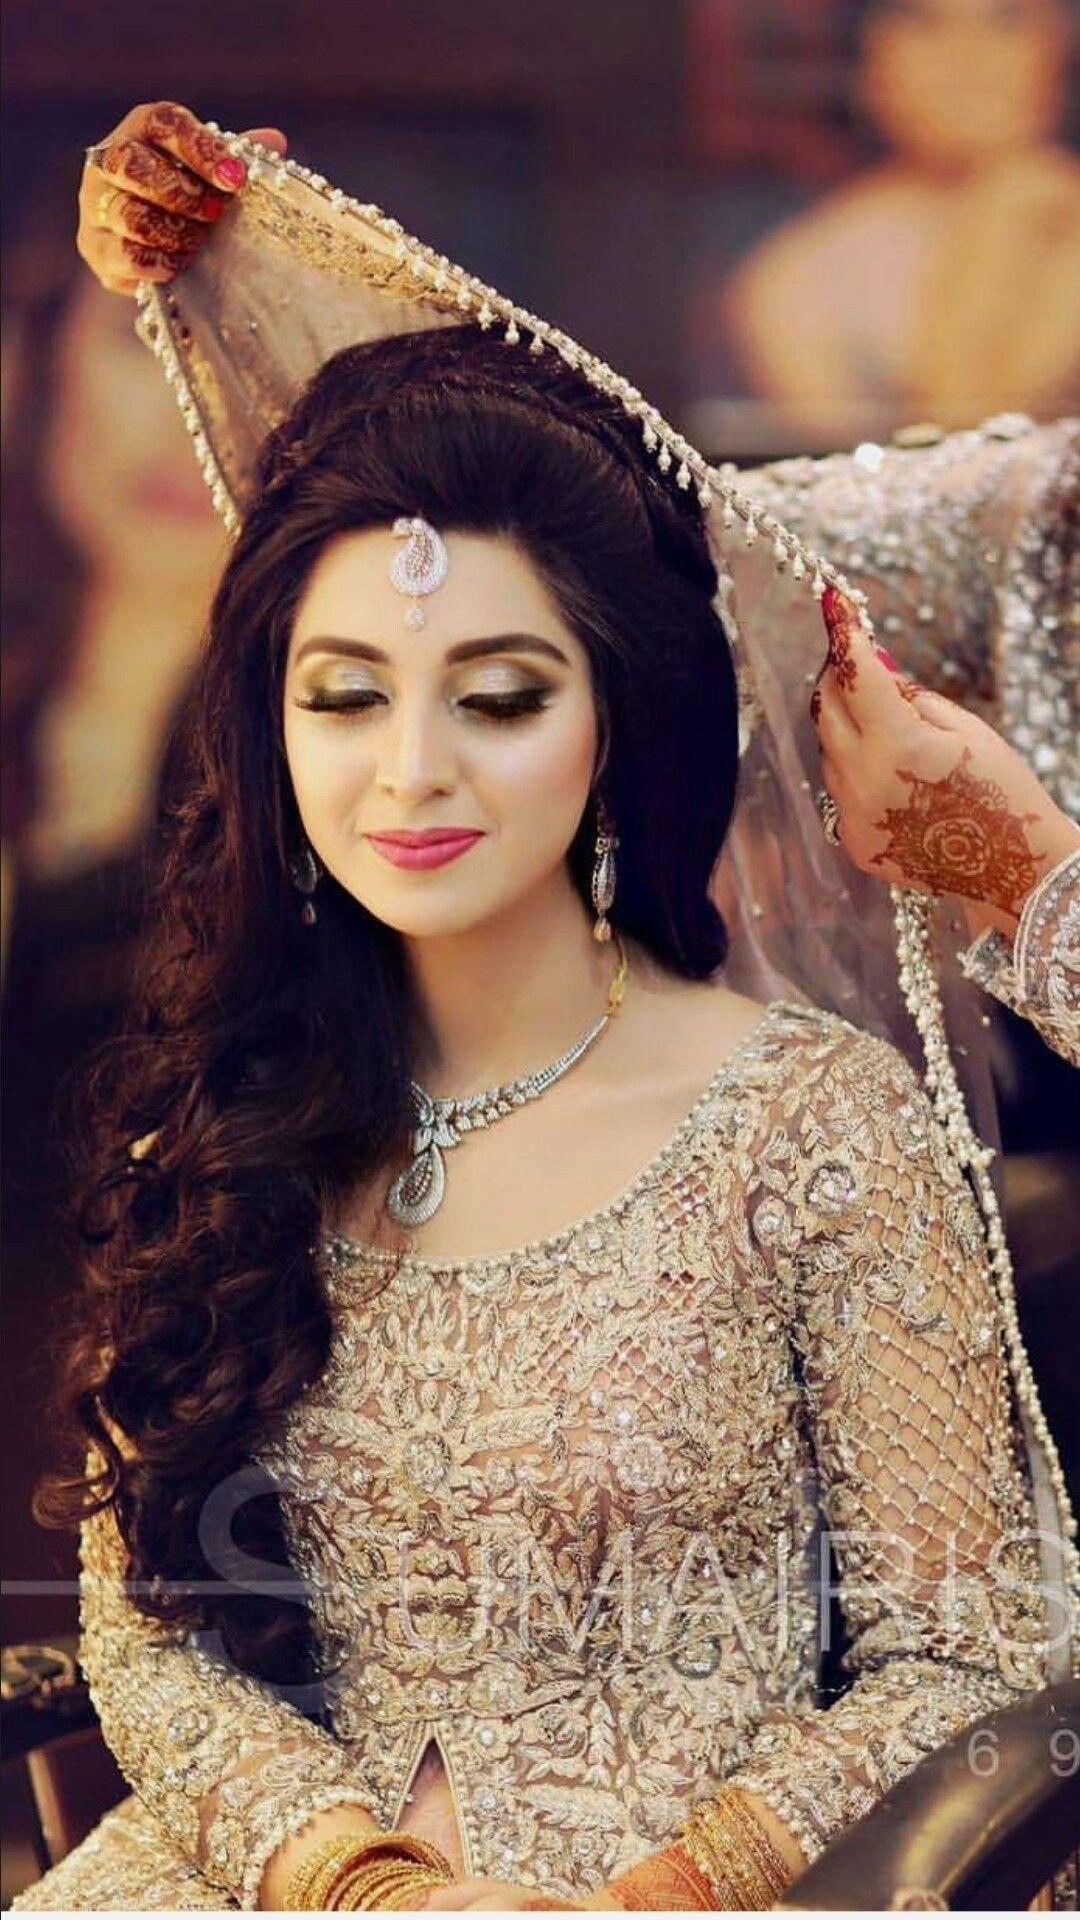 Wedding Hairstyles Pakistani Acupressure Points Pakistani regarding Pakistani Bridal Makeup Photo Sharing